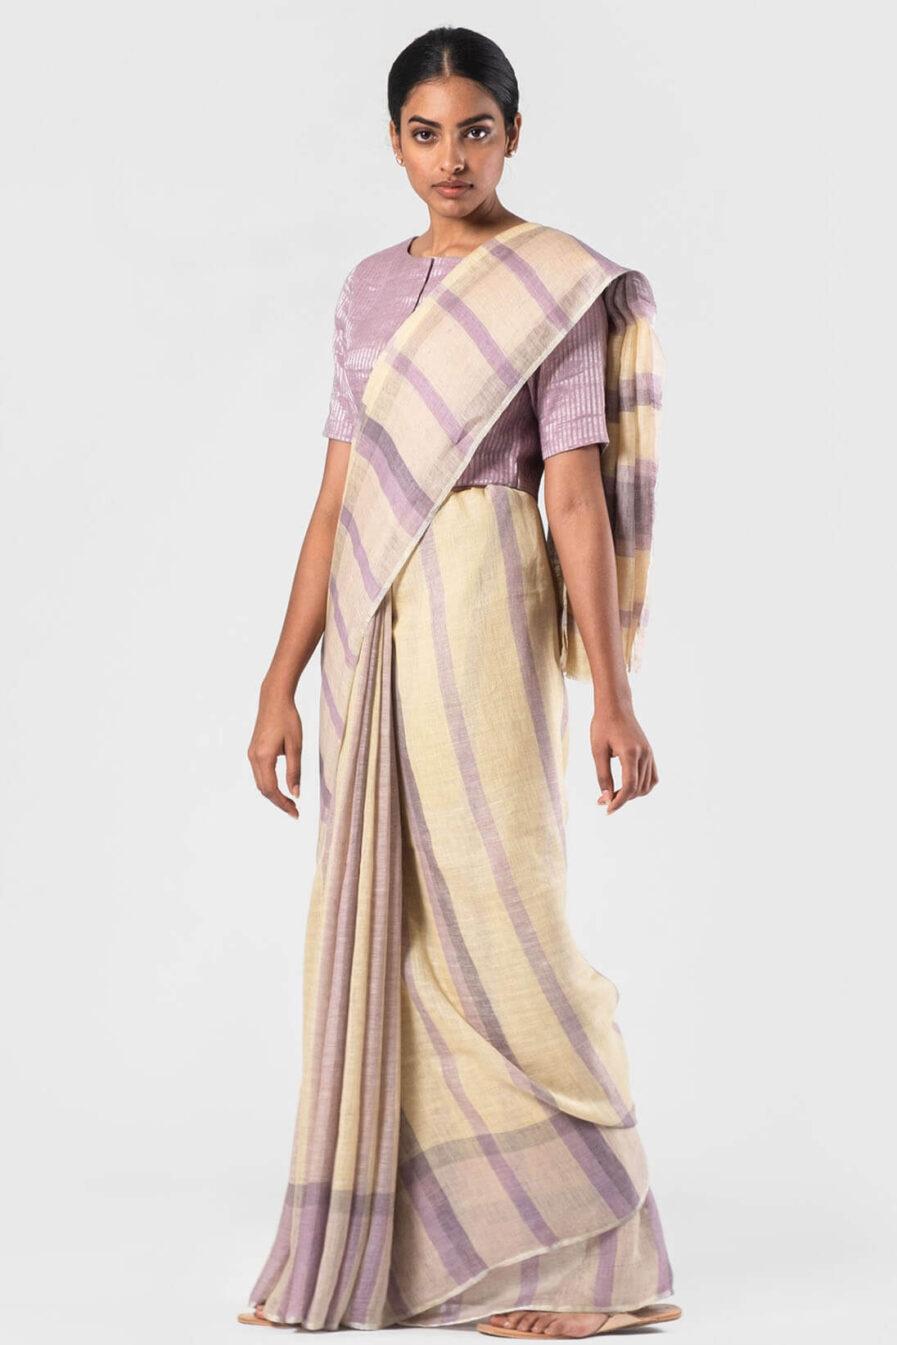 Anavila Lavender-Vanilla Natural plaid summer linen sari